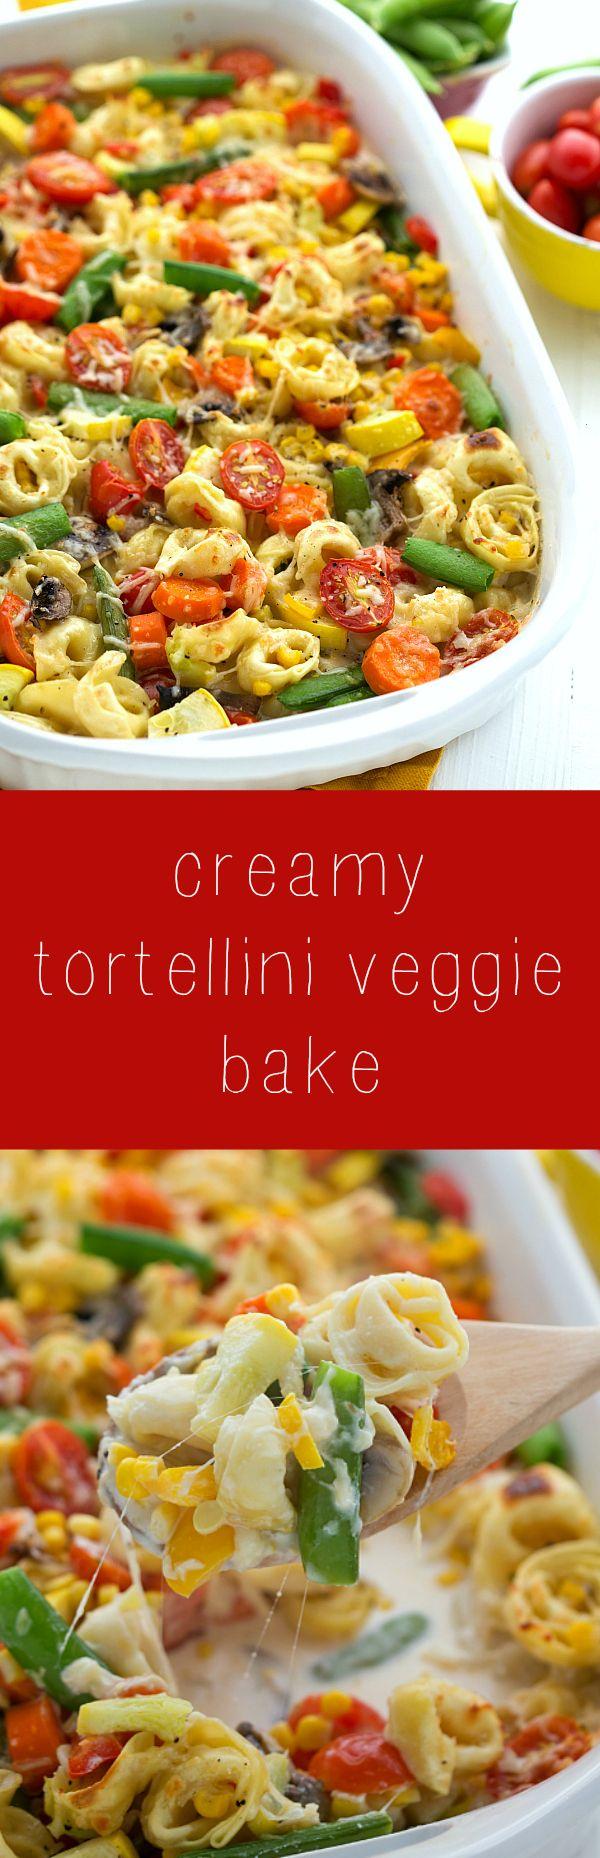 Creamy Tortellini and Vegetable Bake